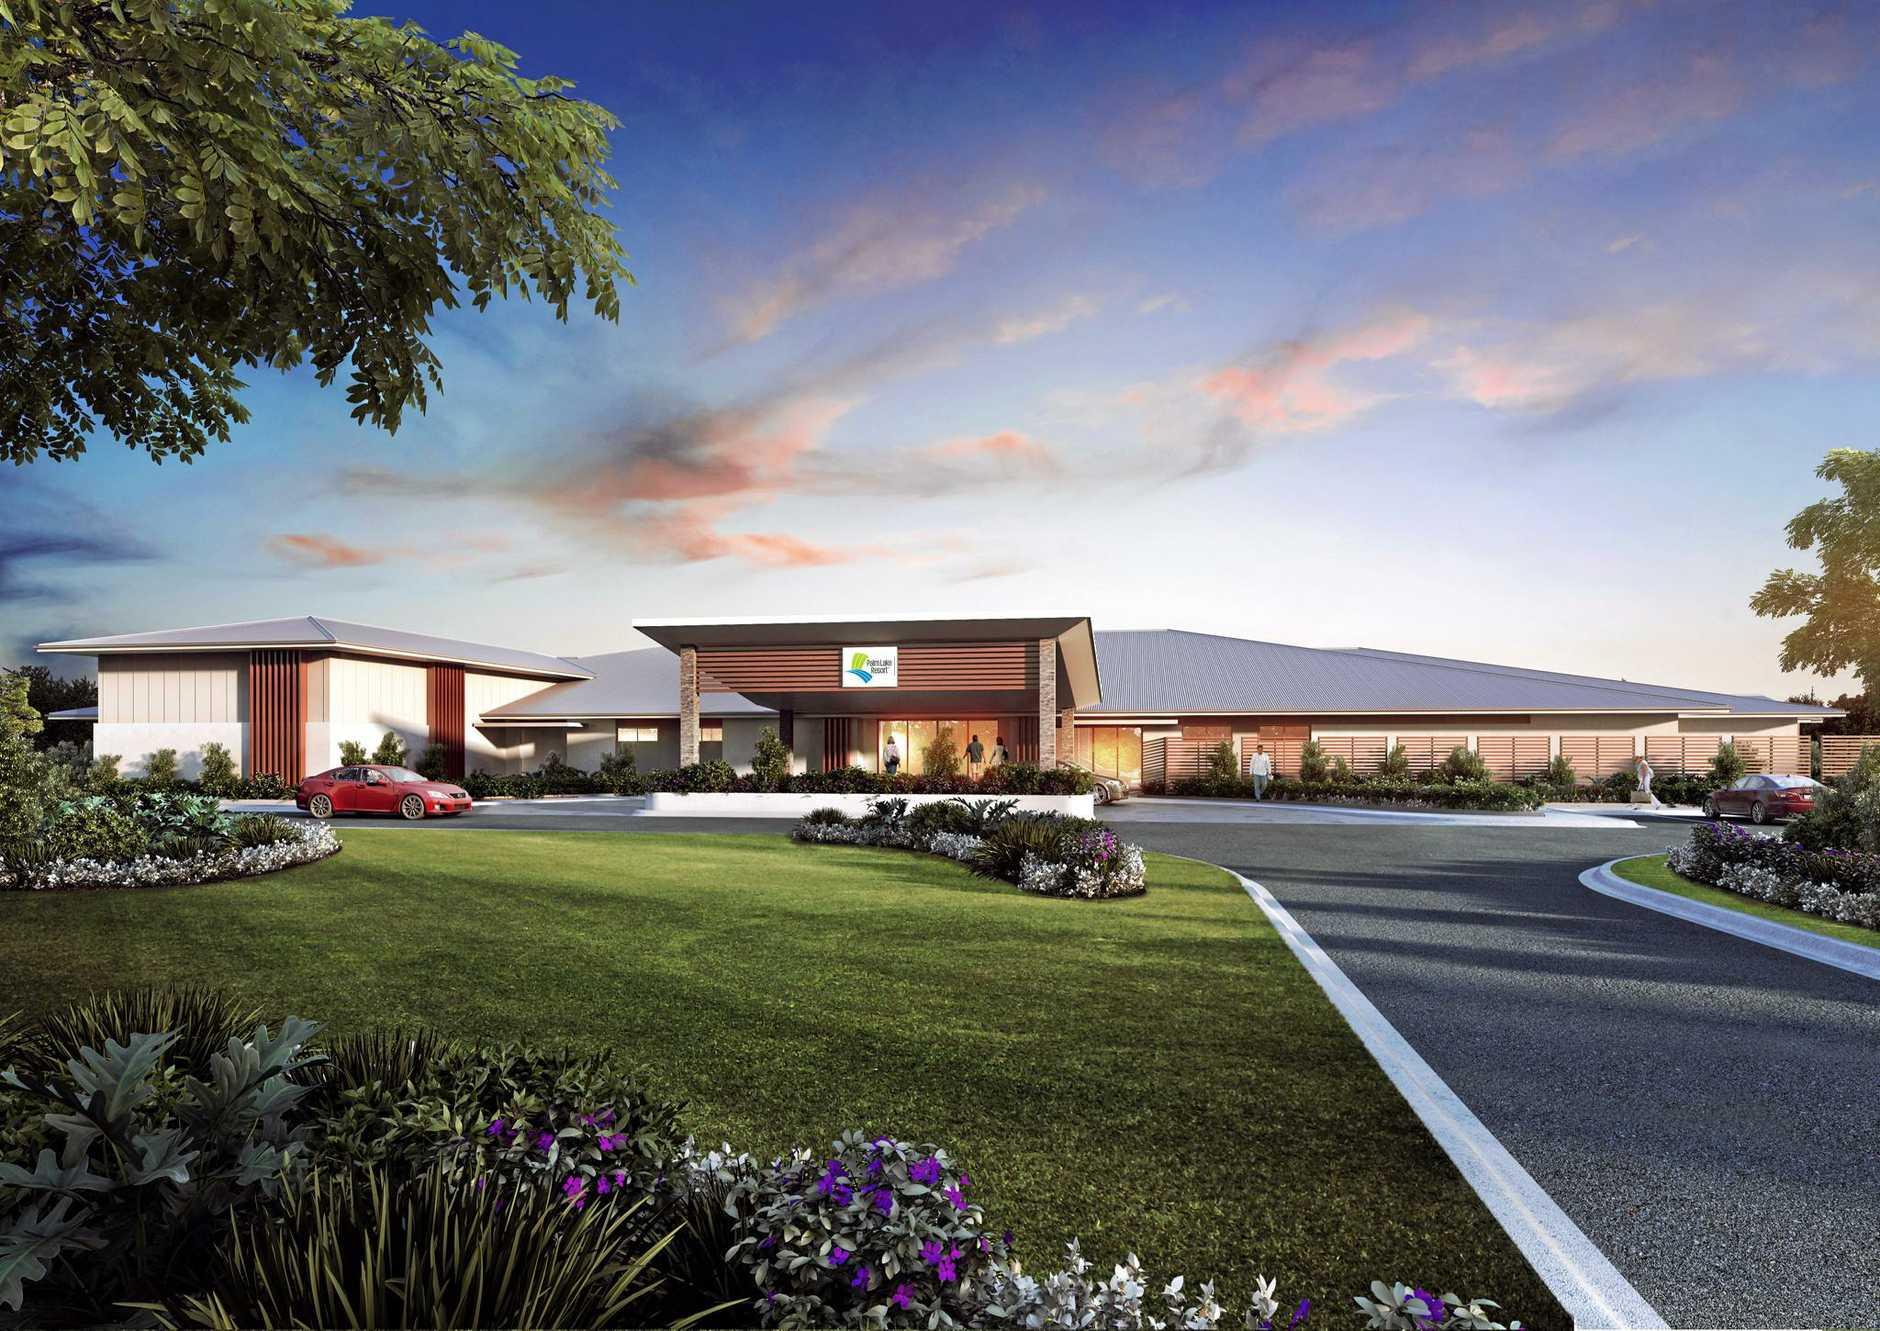 $100m luxury resort opens its doors today | Sunshine Coast Daily